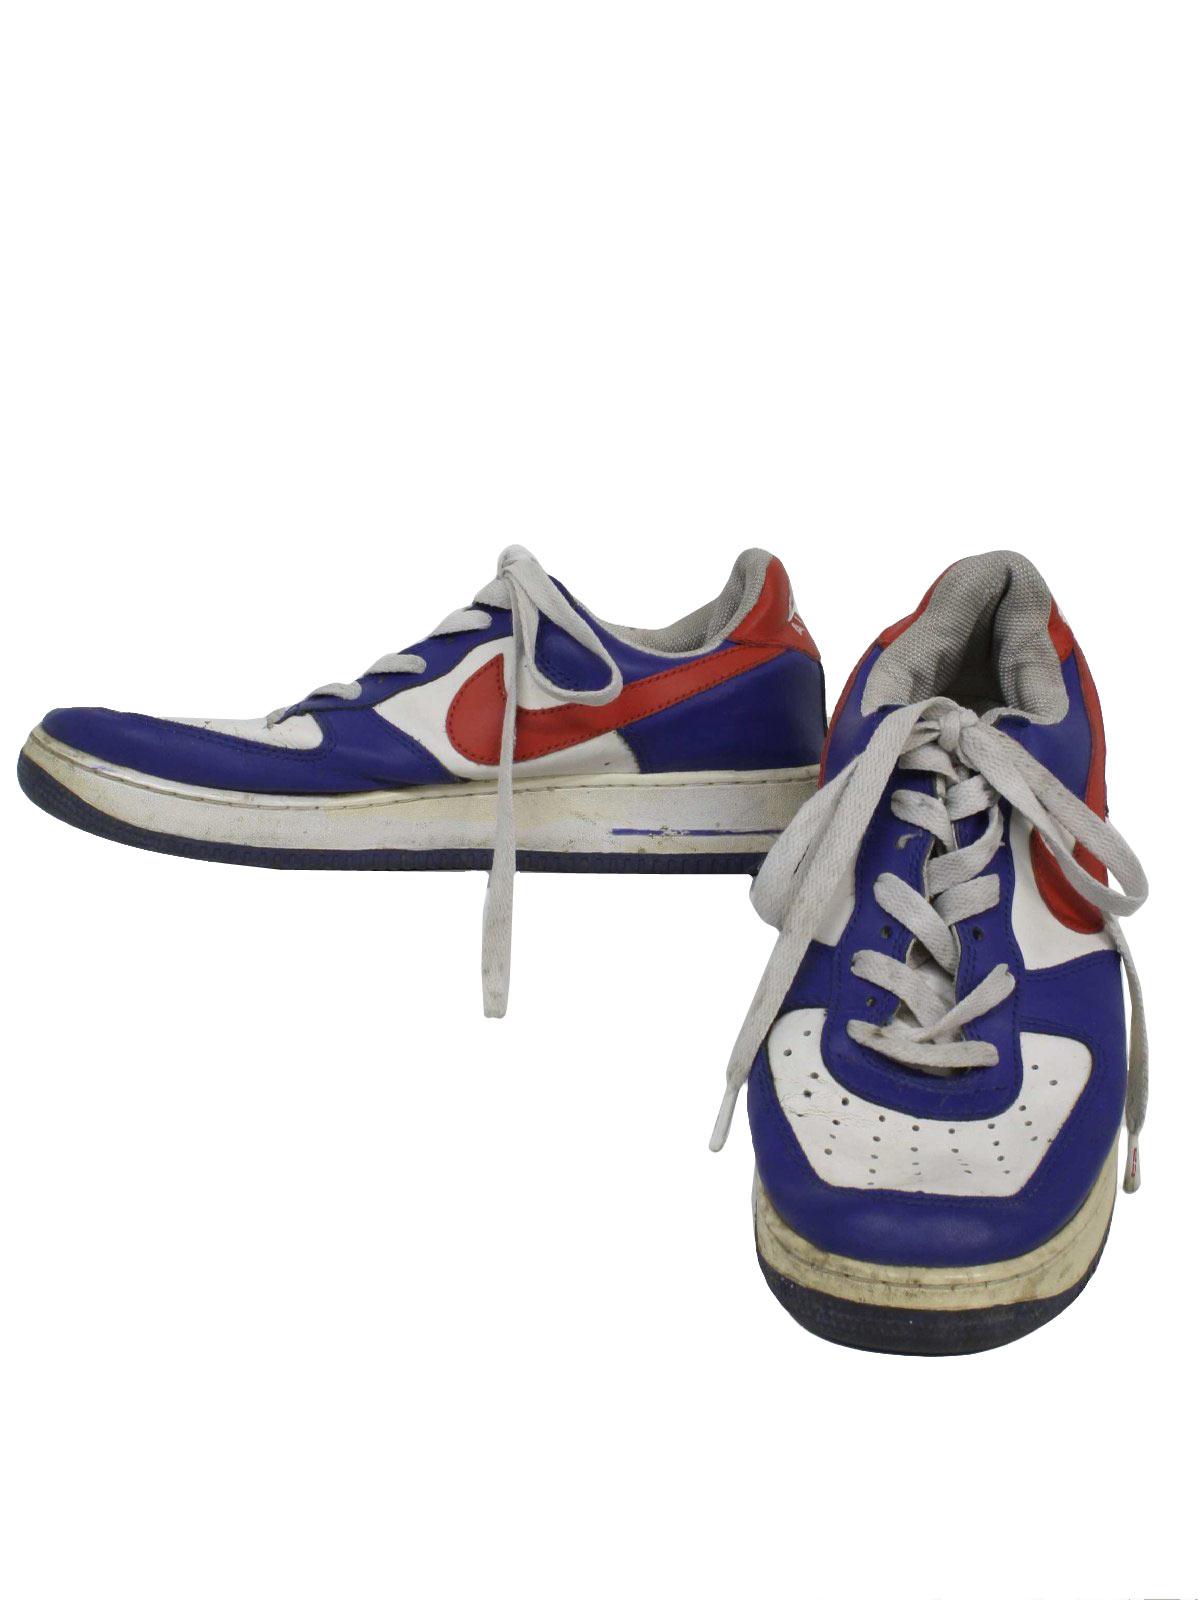 c1938204e98949 Nike Air Force 1 Nineties Vintage Shoes: 90s -Nike Air Force 1- Mens ...